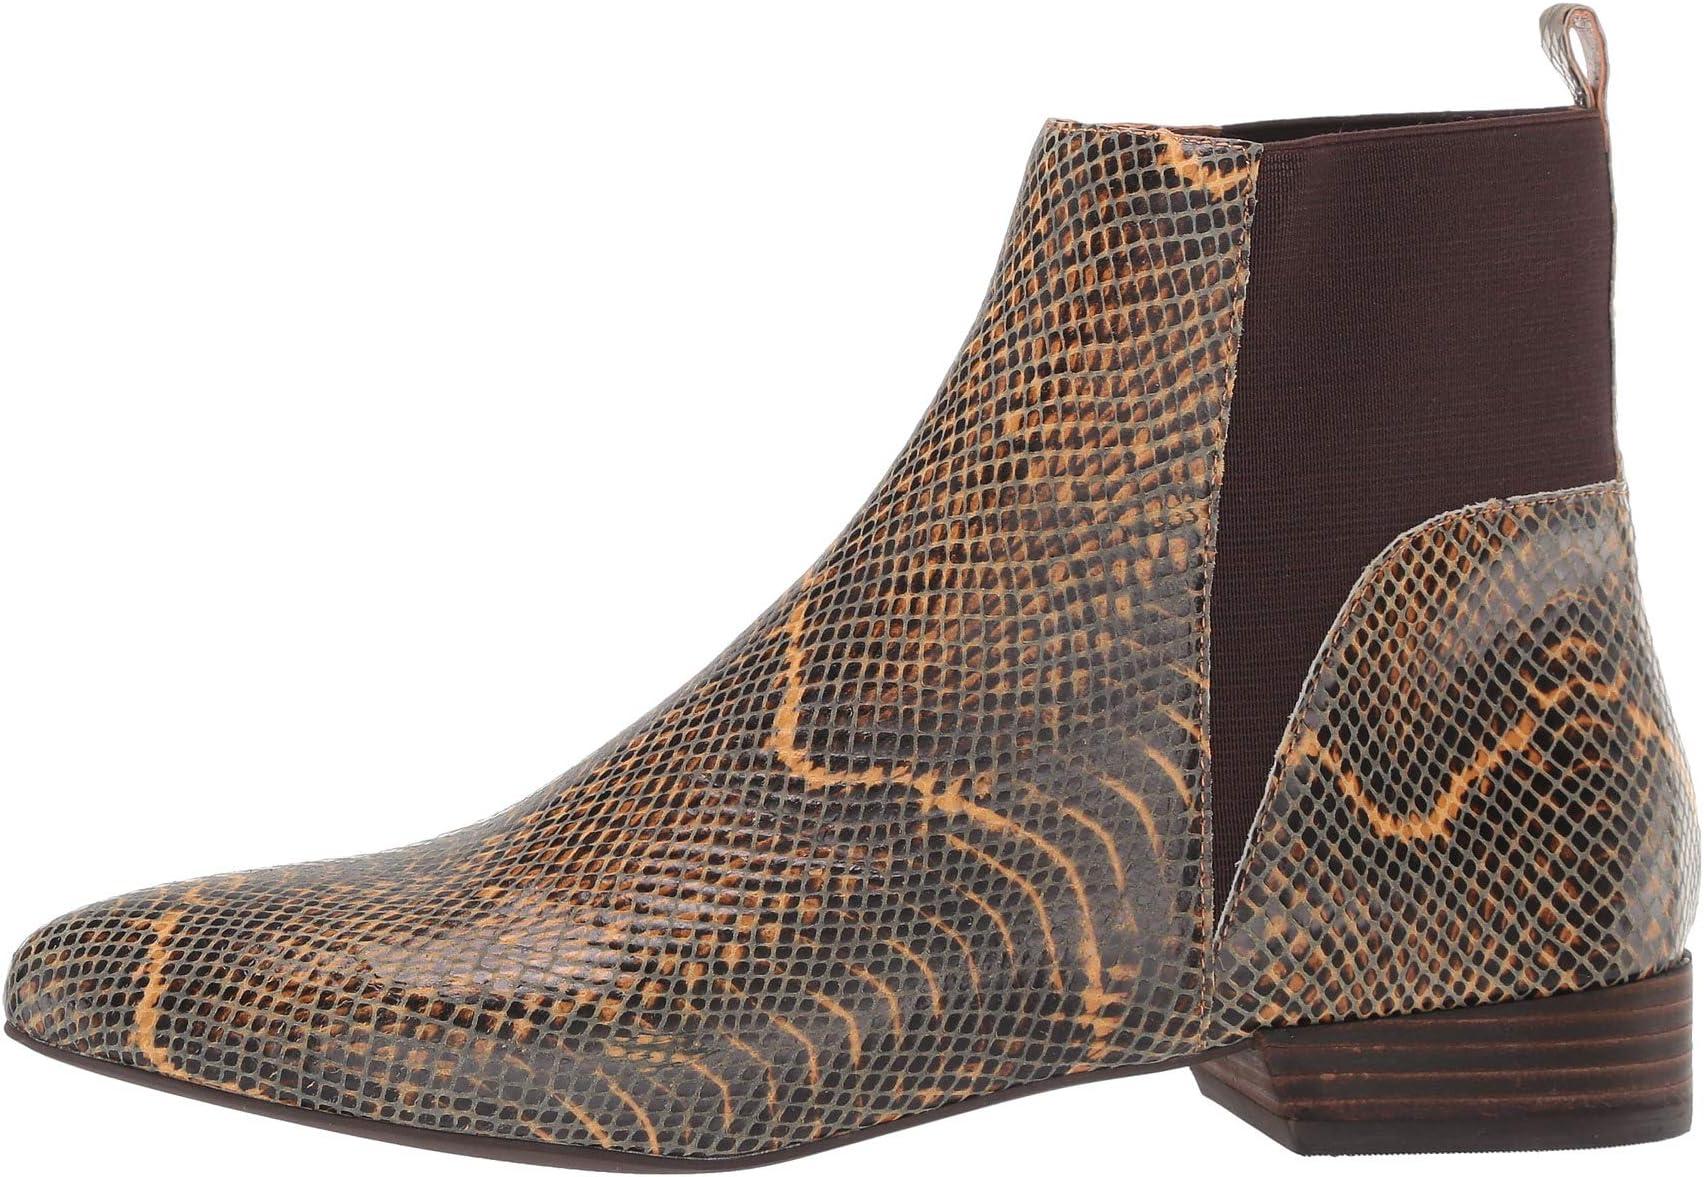 Lucky Brand Gleldo | Women's shoes | 2020 Newest